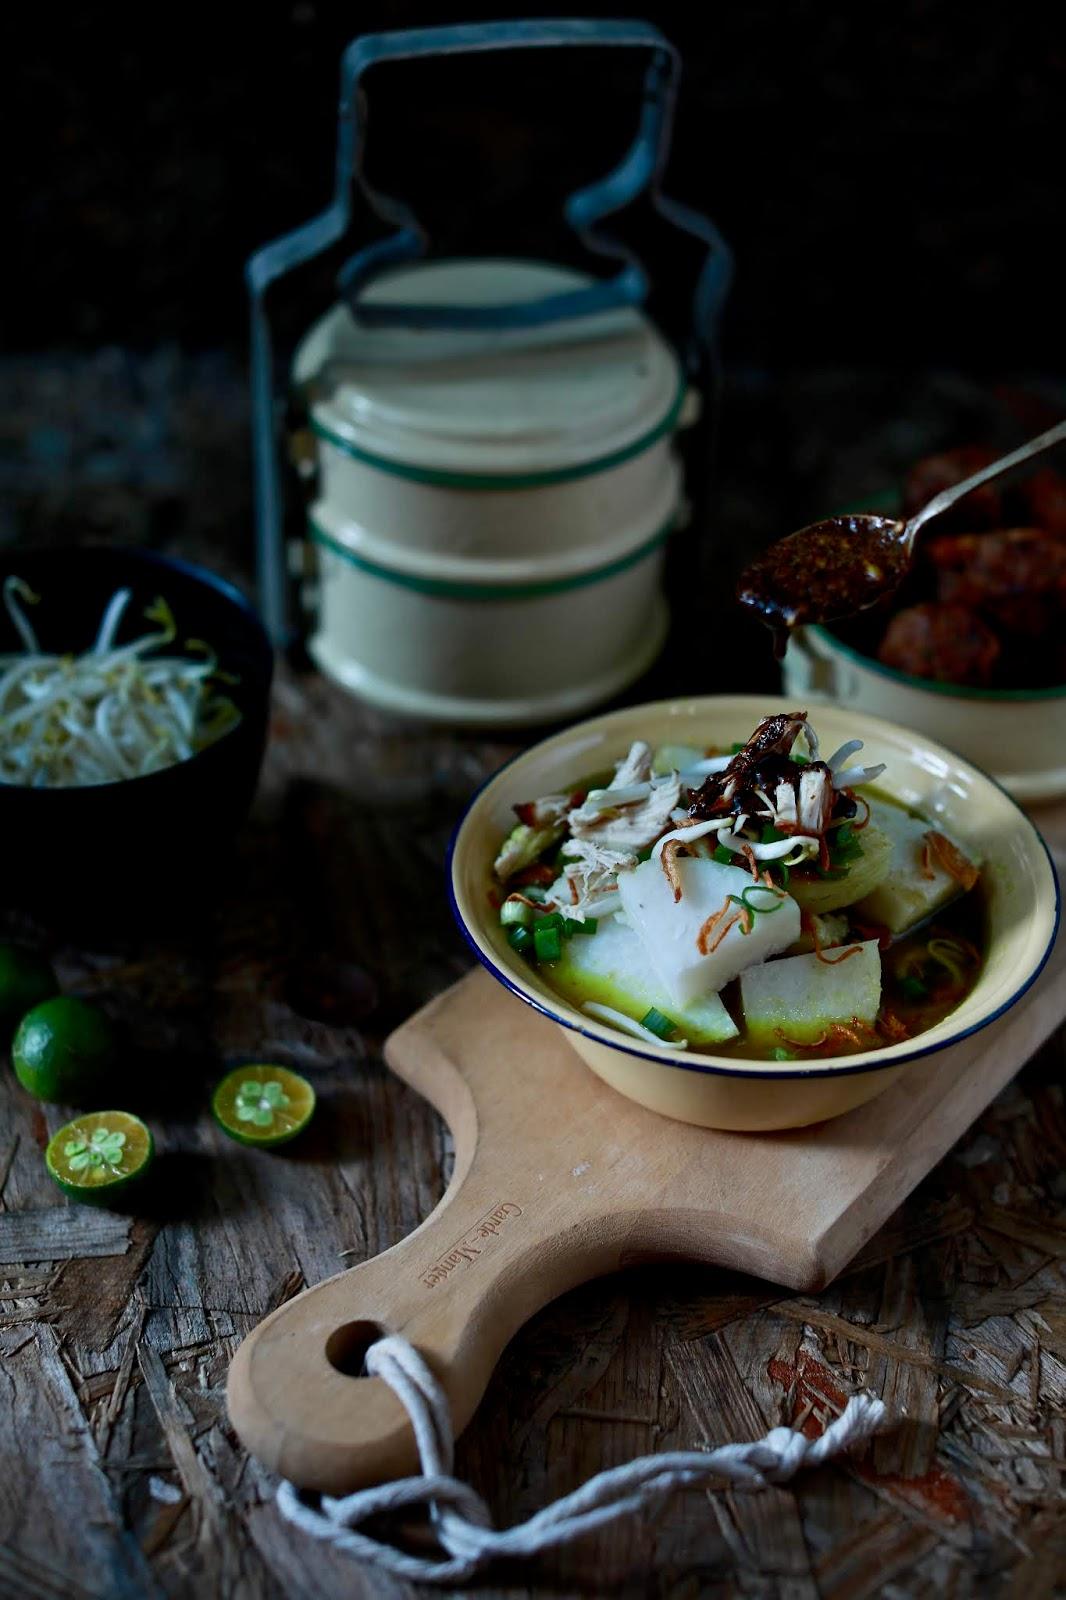 resipi soto ayam mudah resepi bergambar Resepi Sup Ayam Sedap Azie Kitchen Enak dan Mudah